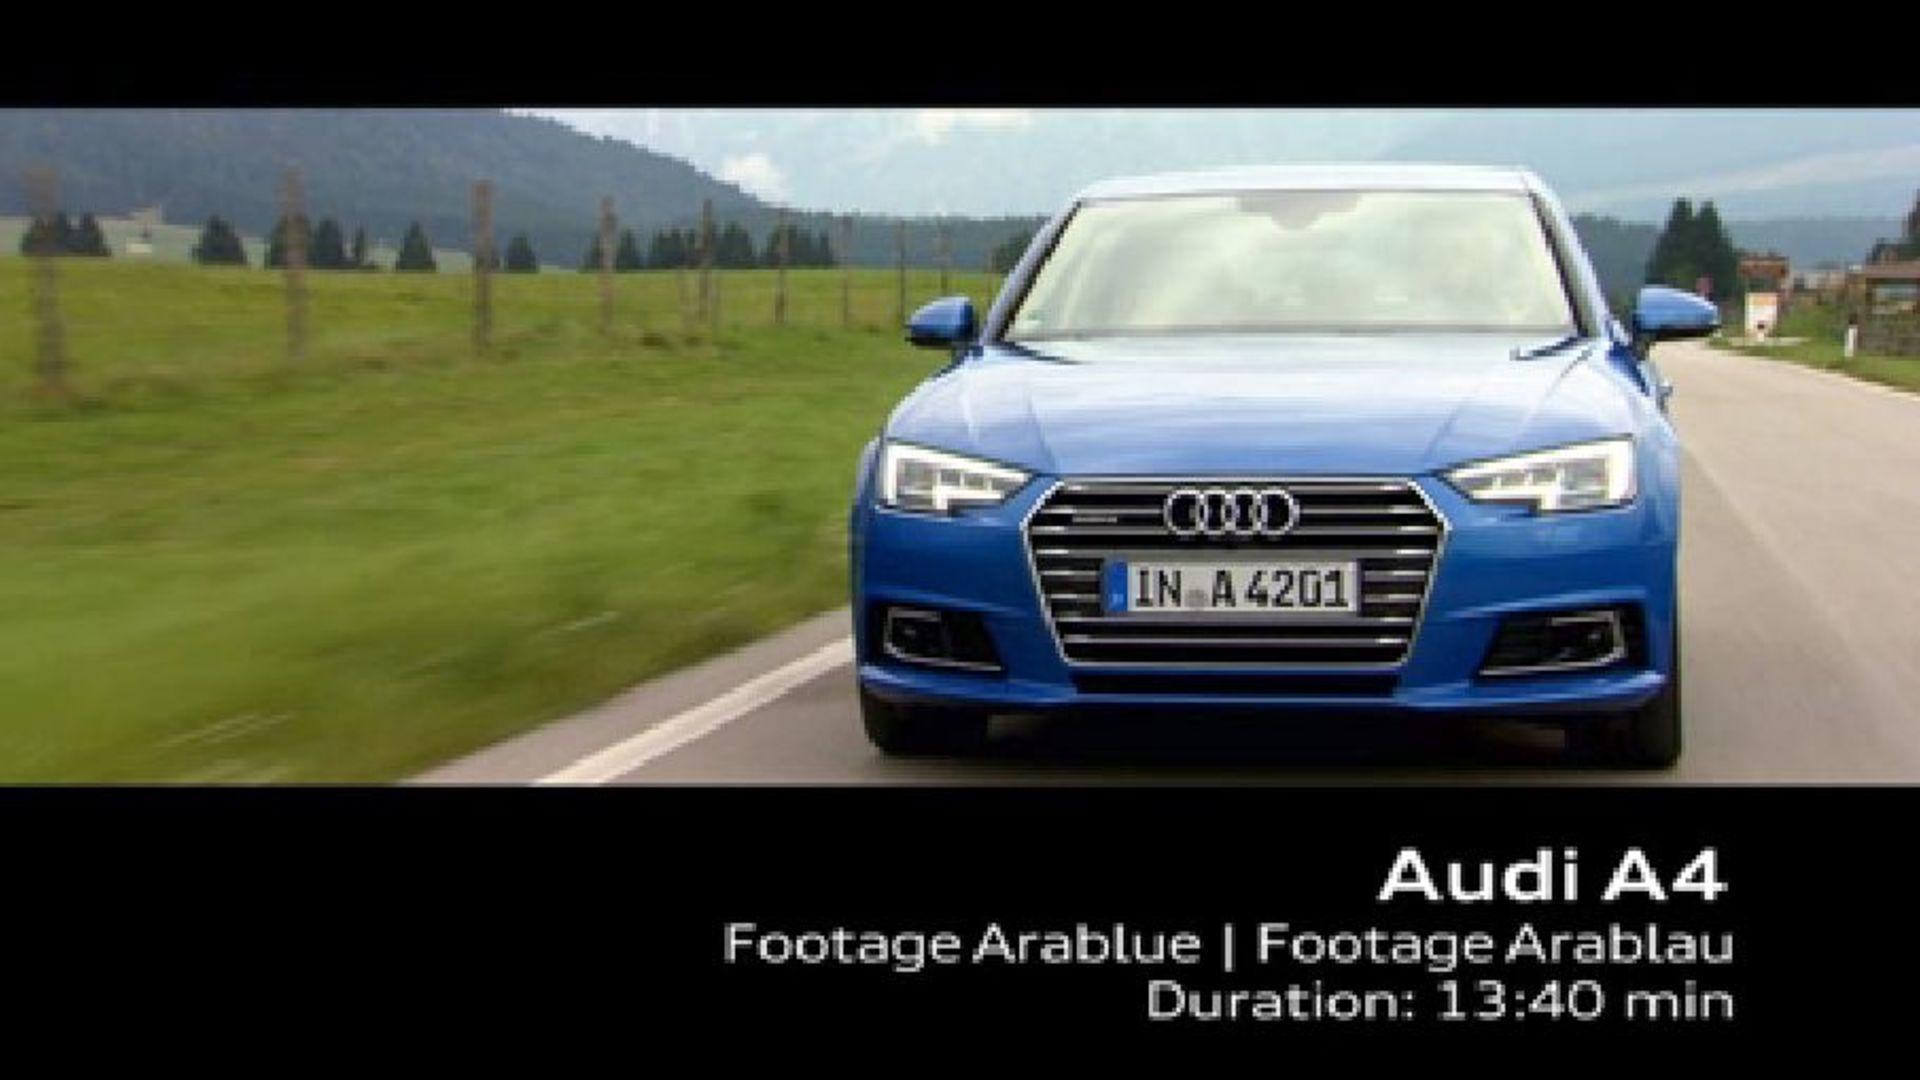 Audi A4 (2015) - Footage on Location